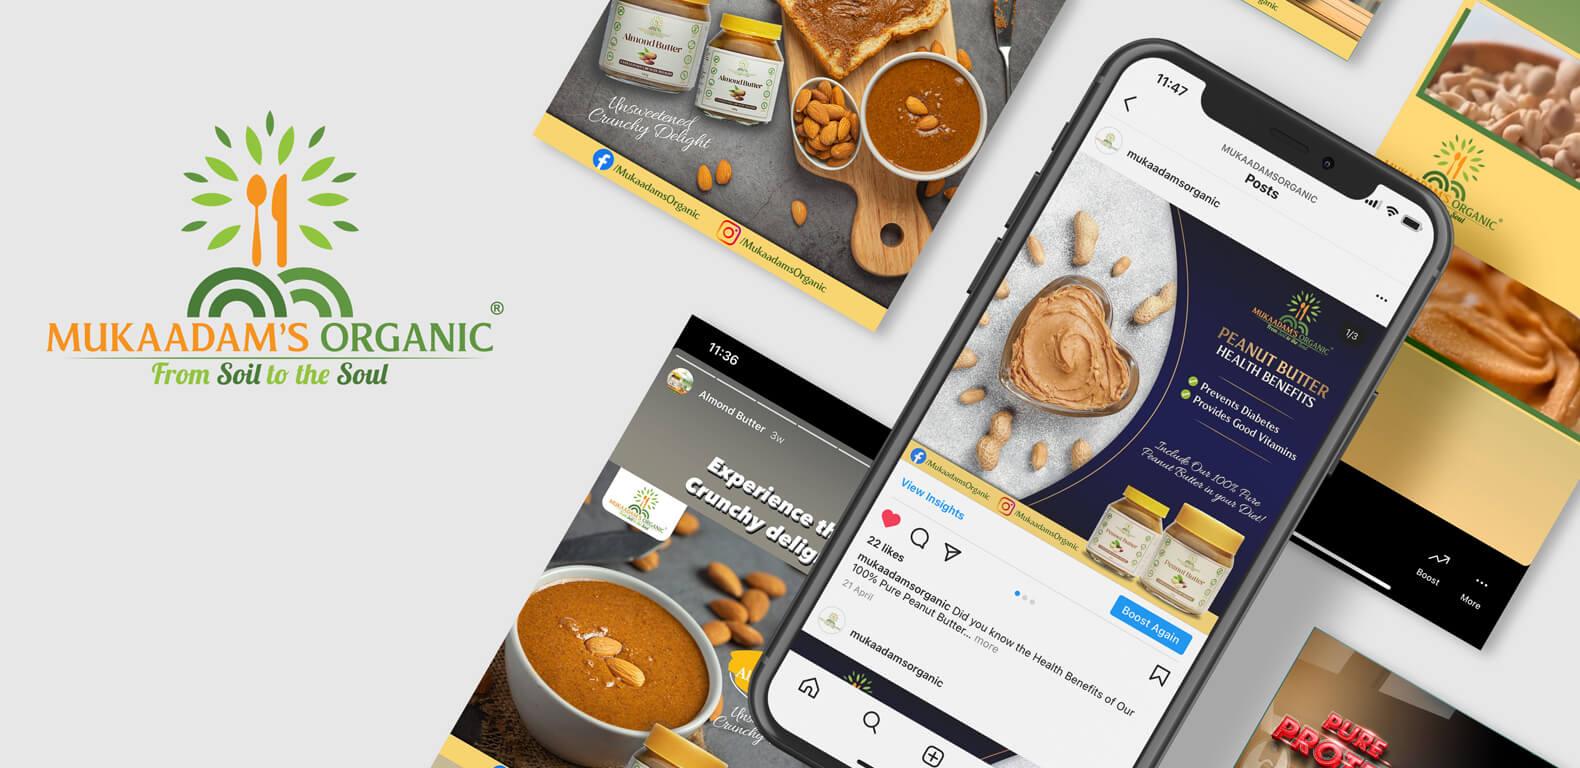 social-media-marketing-mukaadams-organic